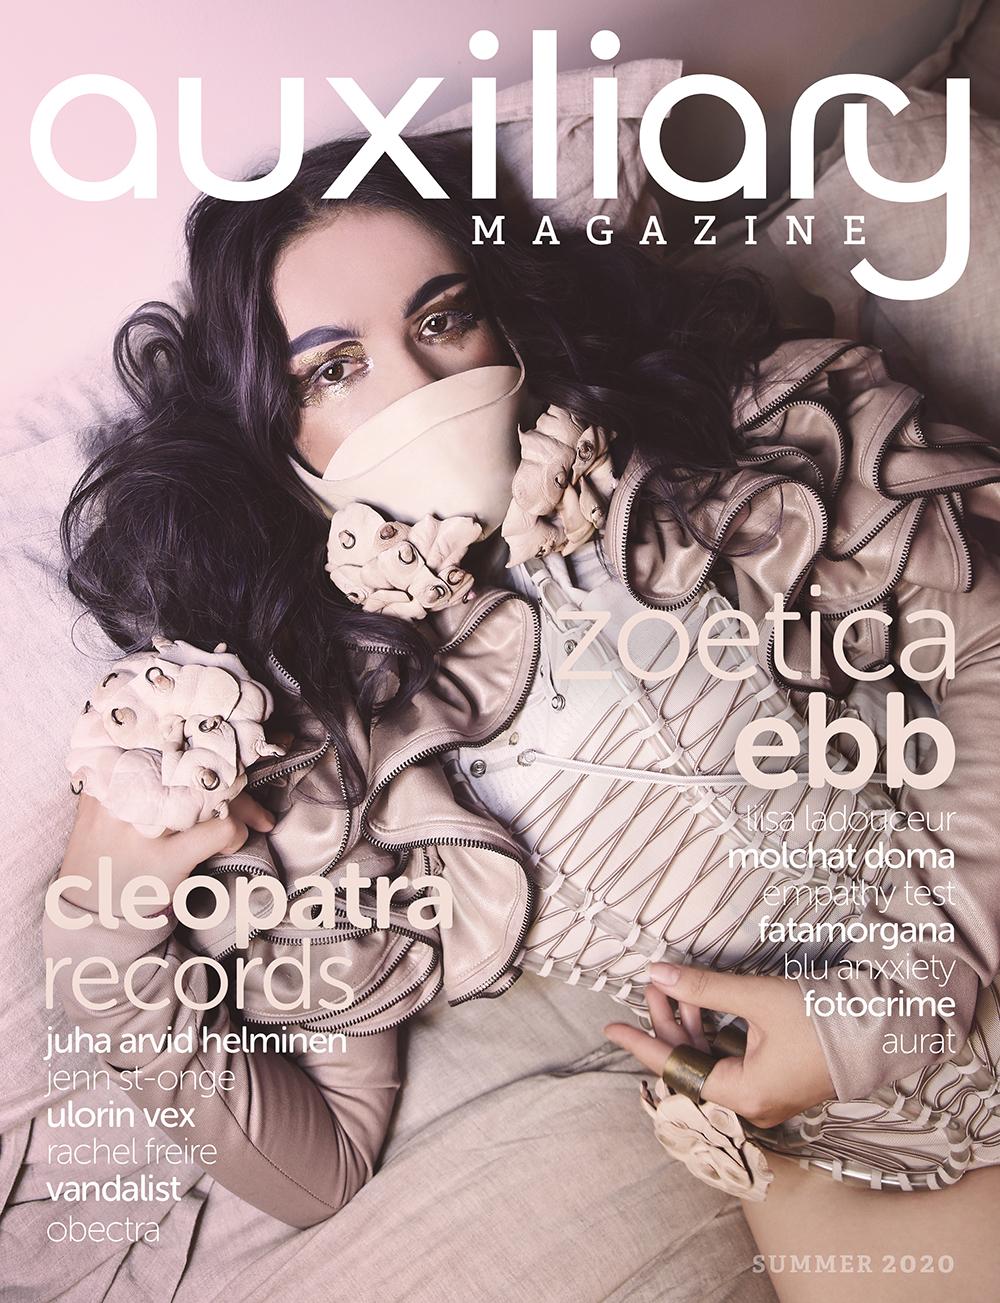 Auxiliary Magazine Summer 2020 Issue